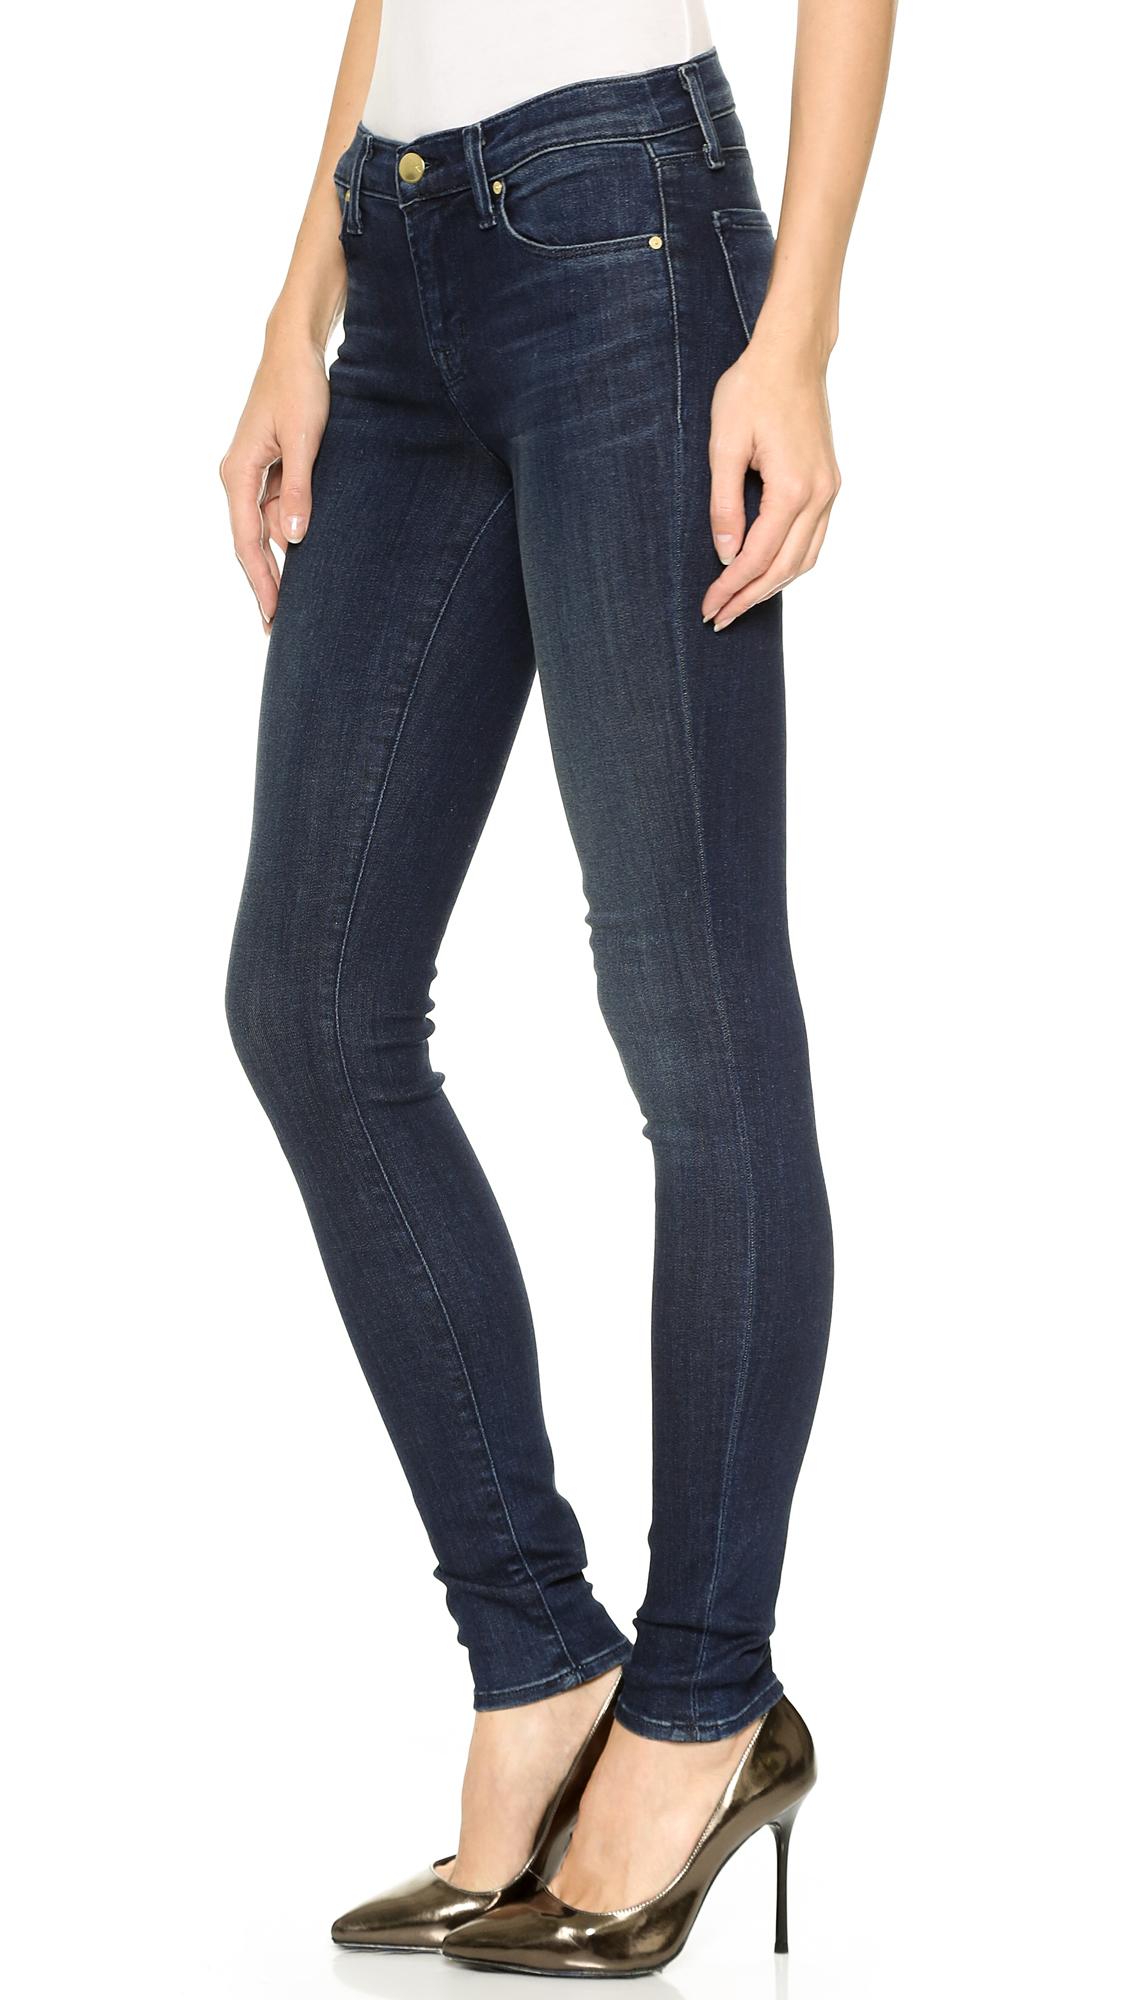 46bd3ad3248e J Brand 620 Mid Rise Super Skinny Jeans - Fix in Blue - Lyst